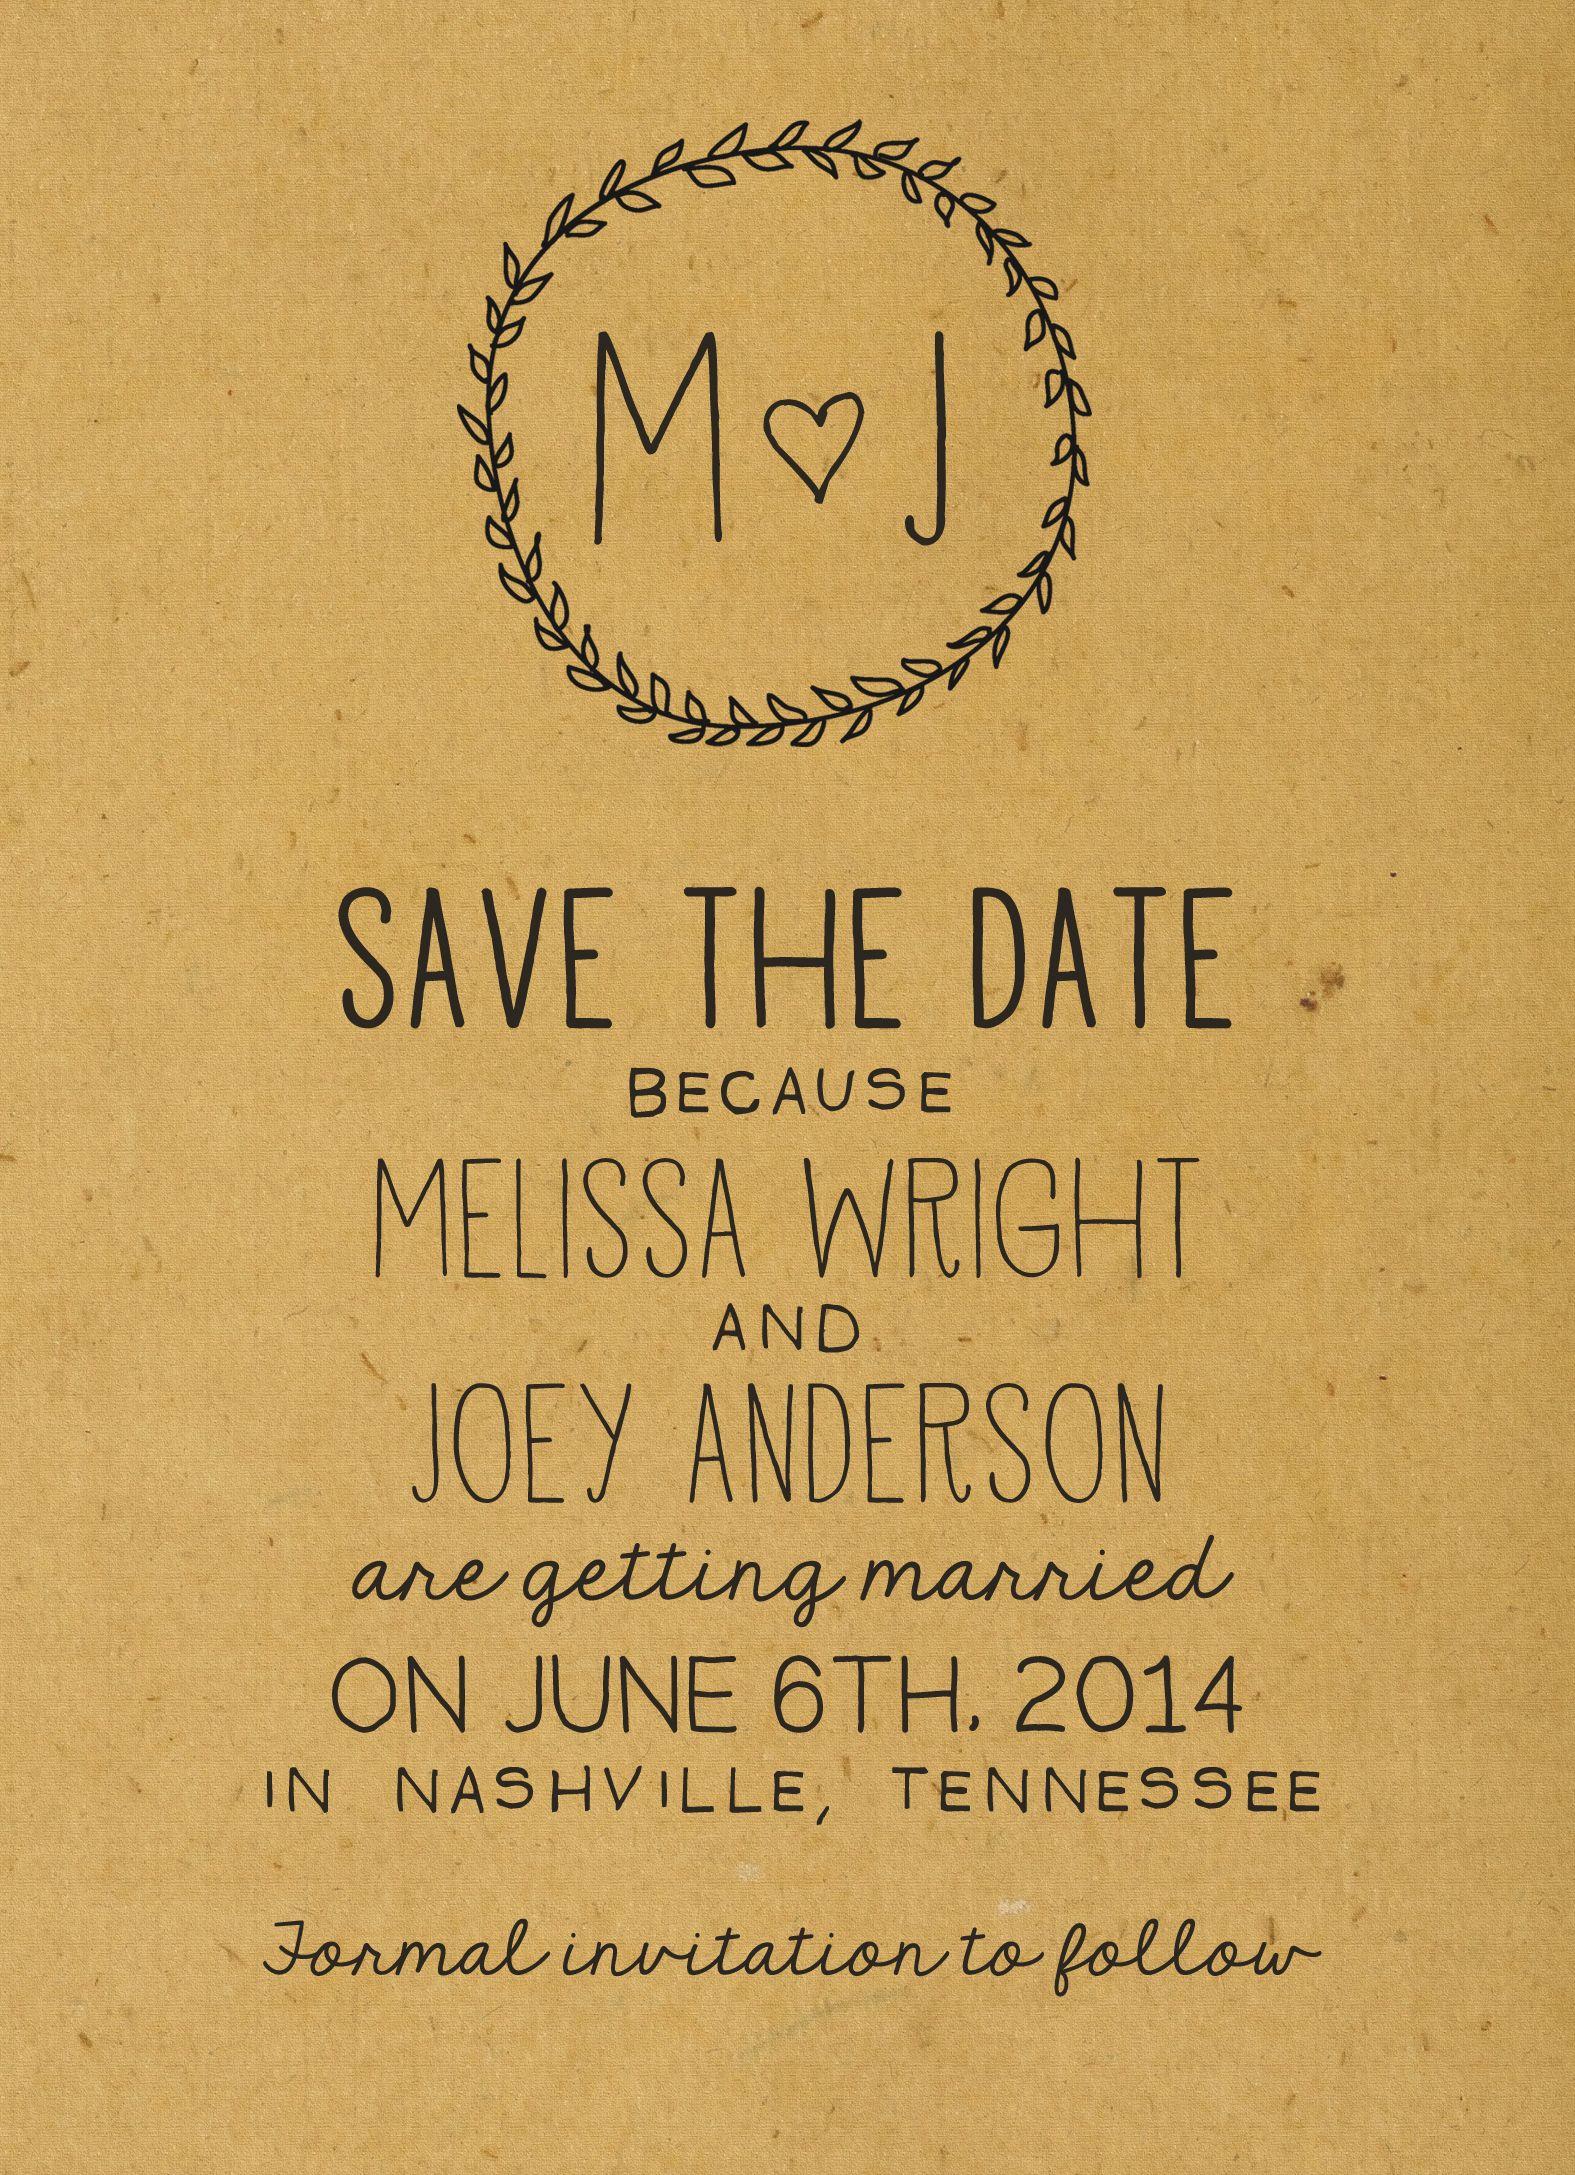 Rustic Save the Date // Minimalist Wedding // Boho Chic, Shabby Chic, Country Wedding